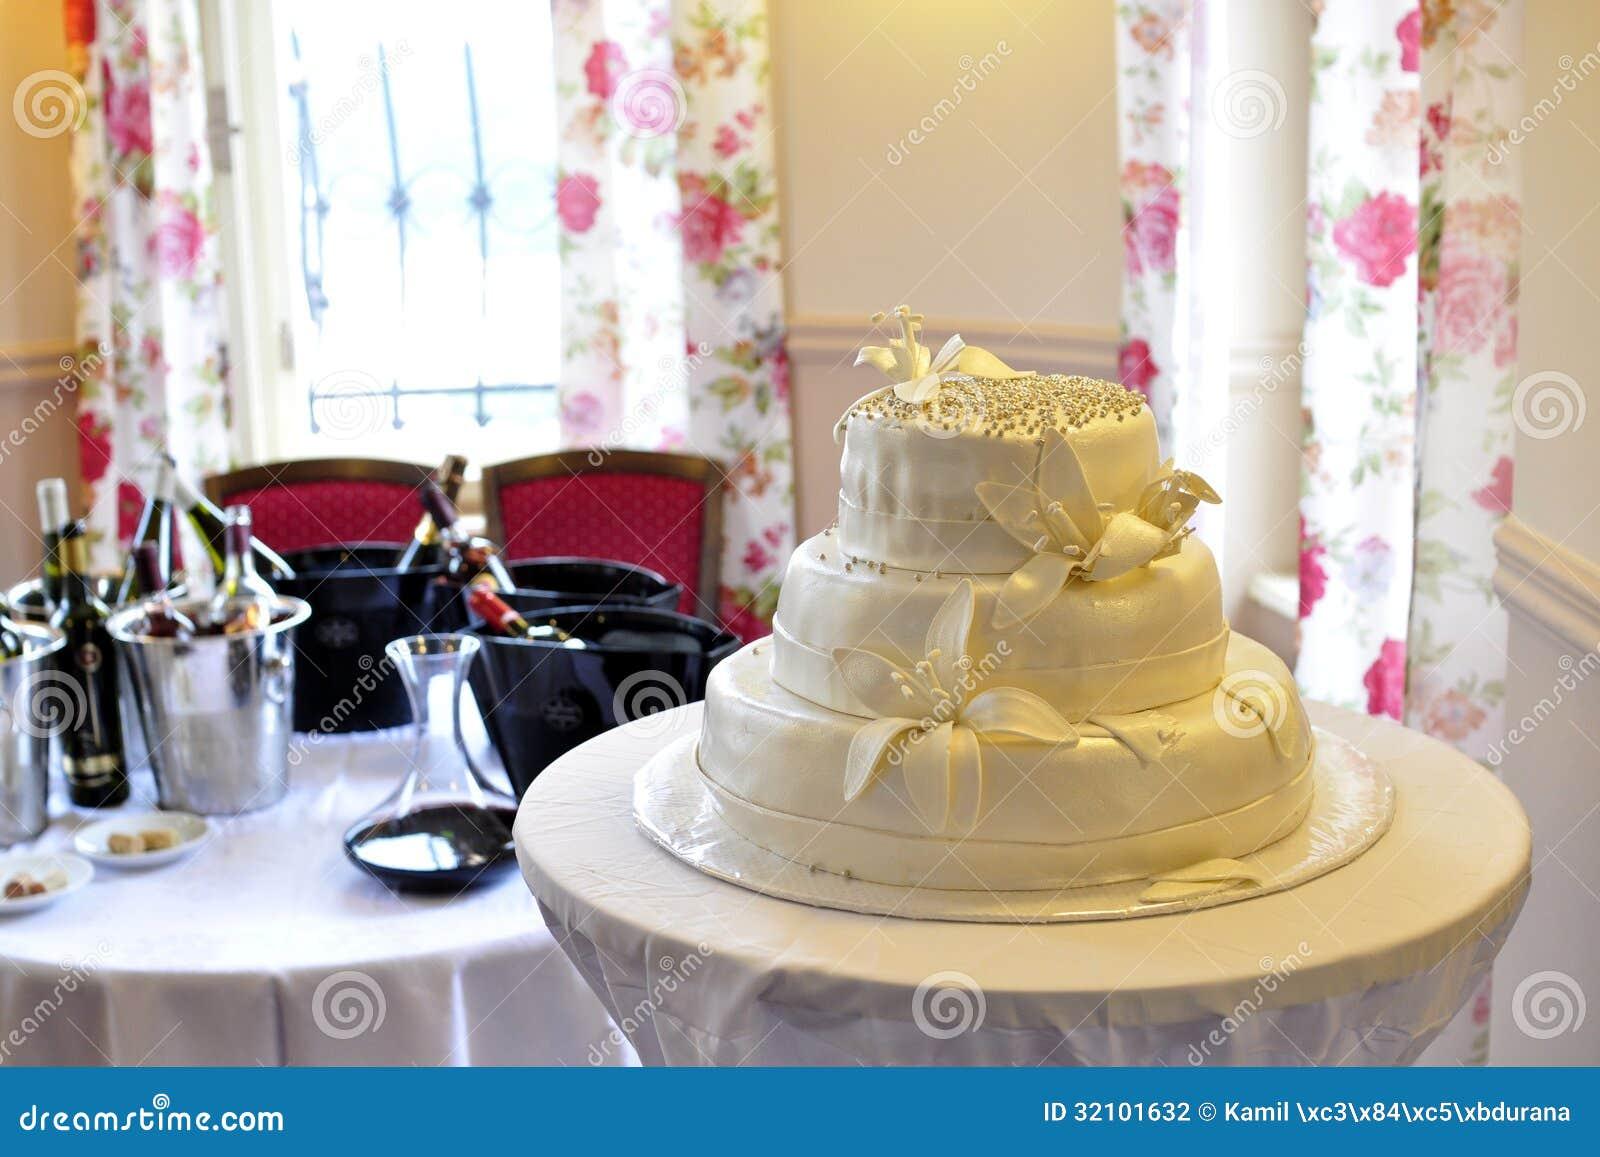 Bröllopstårtaflaskor av vin